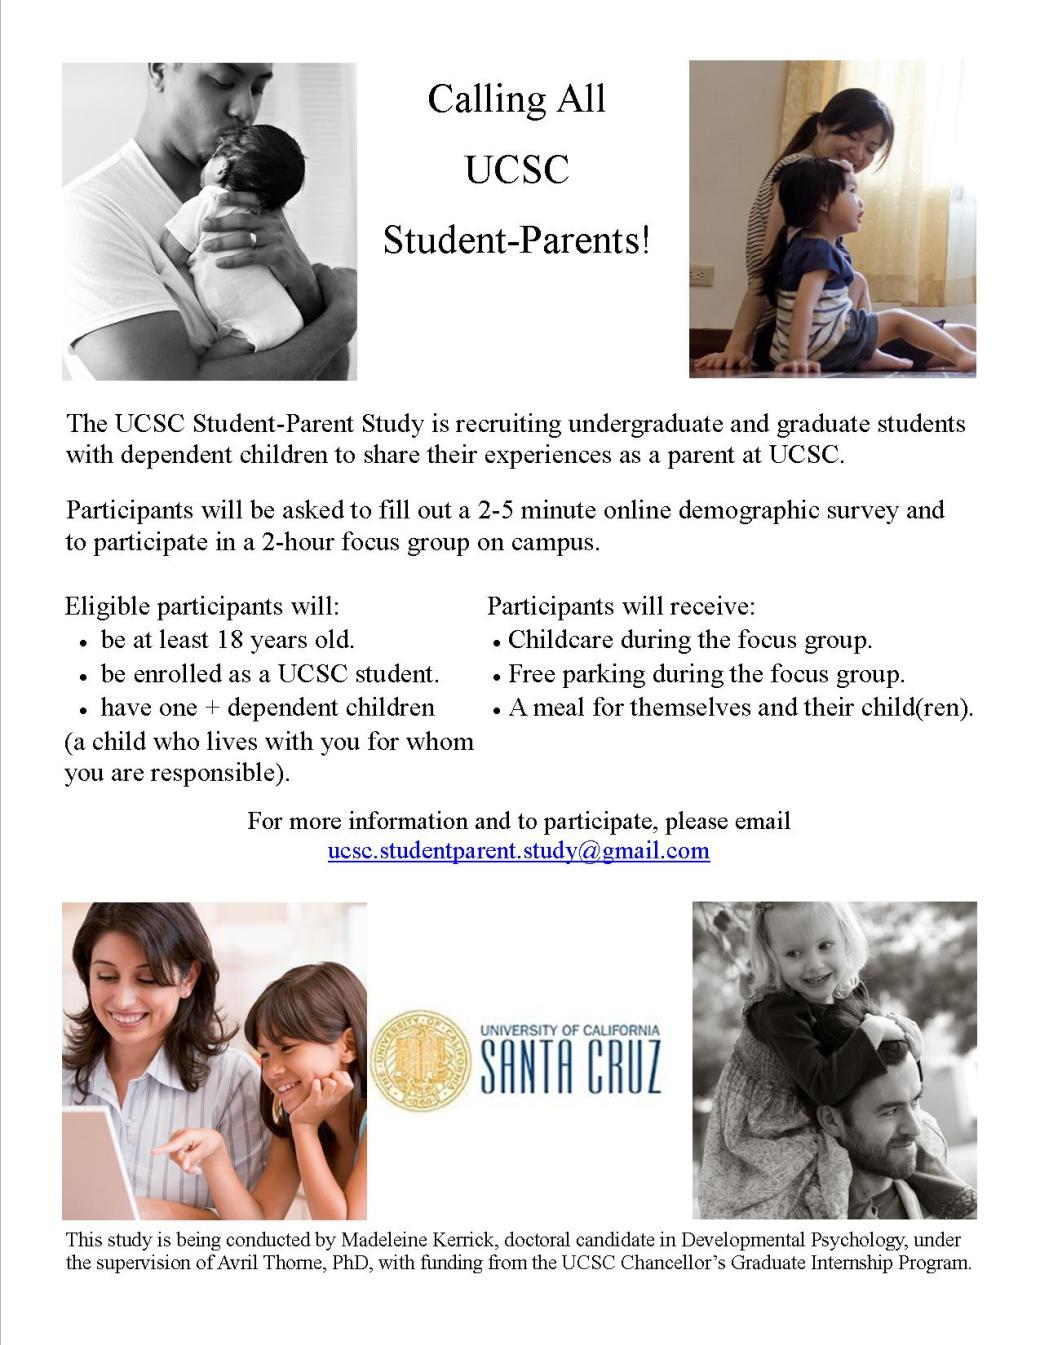 ucsc-student-parent-recruitment-flyer